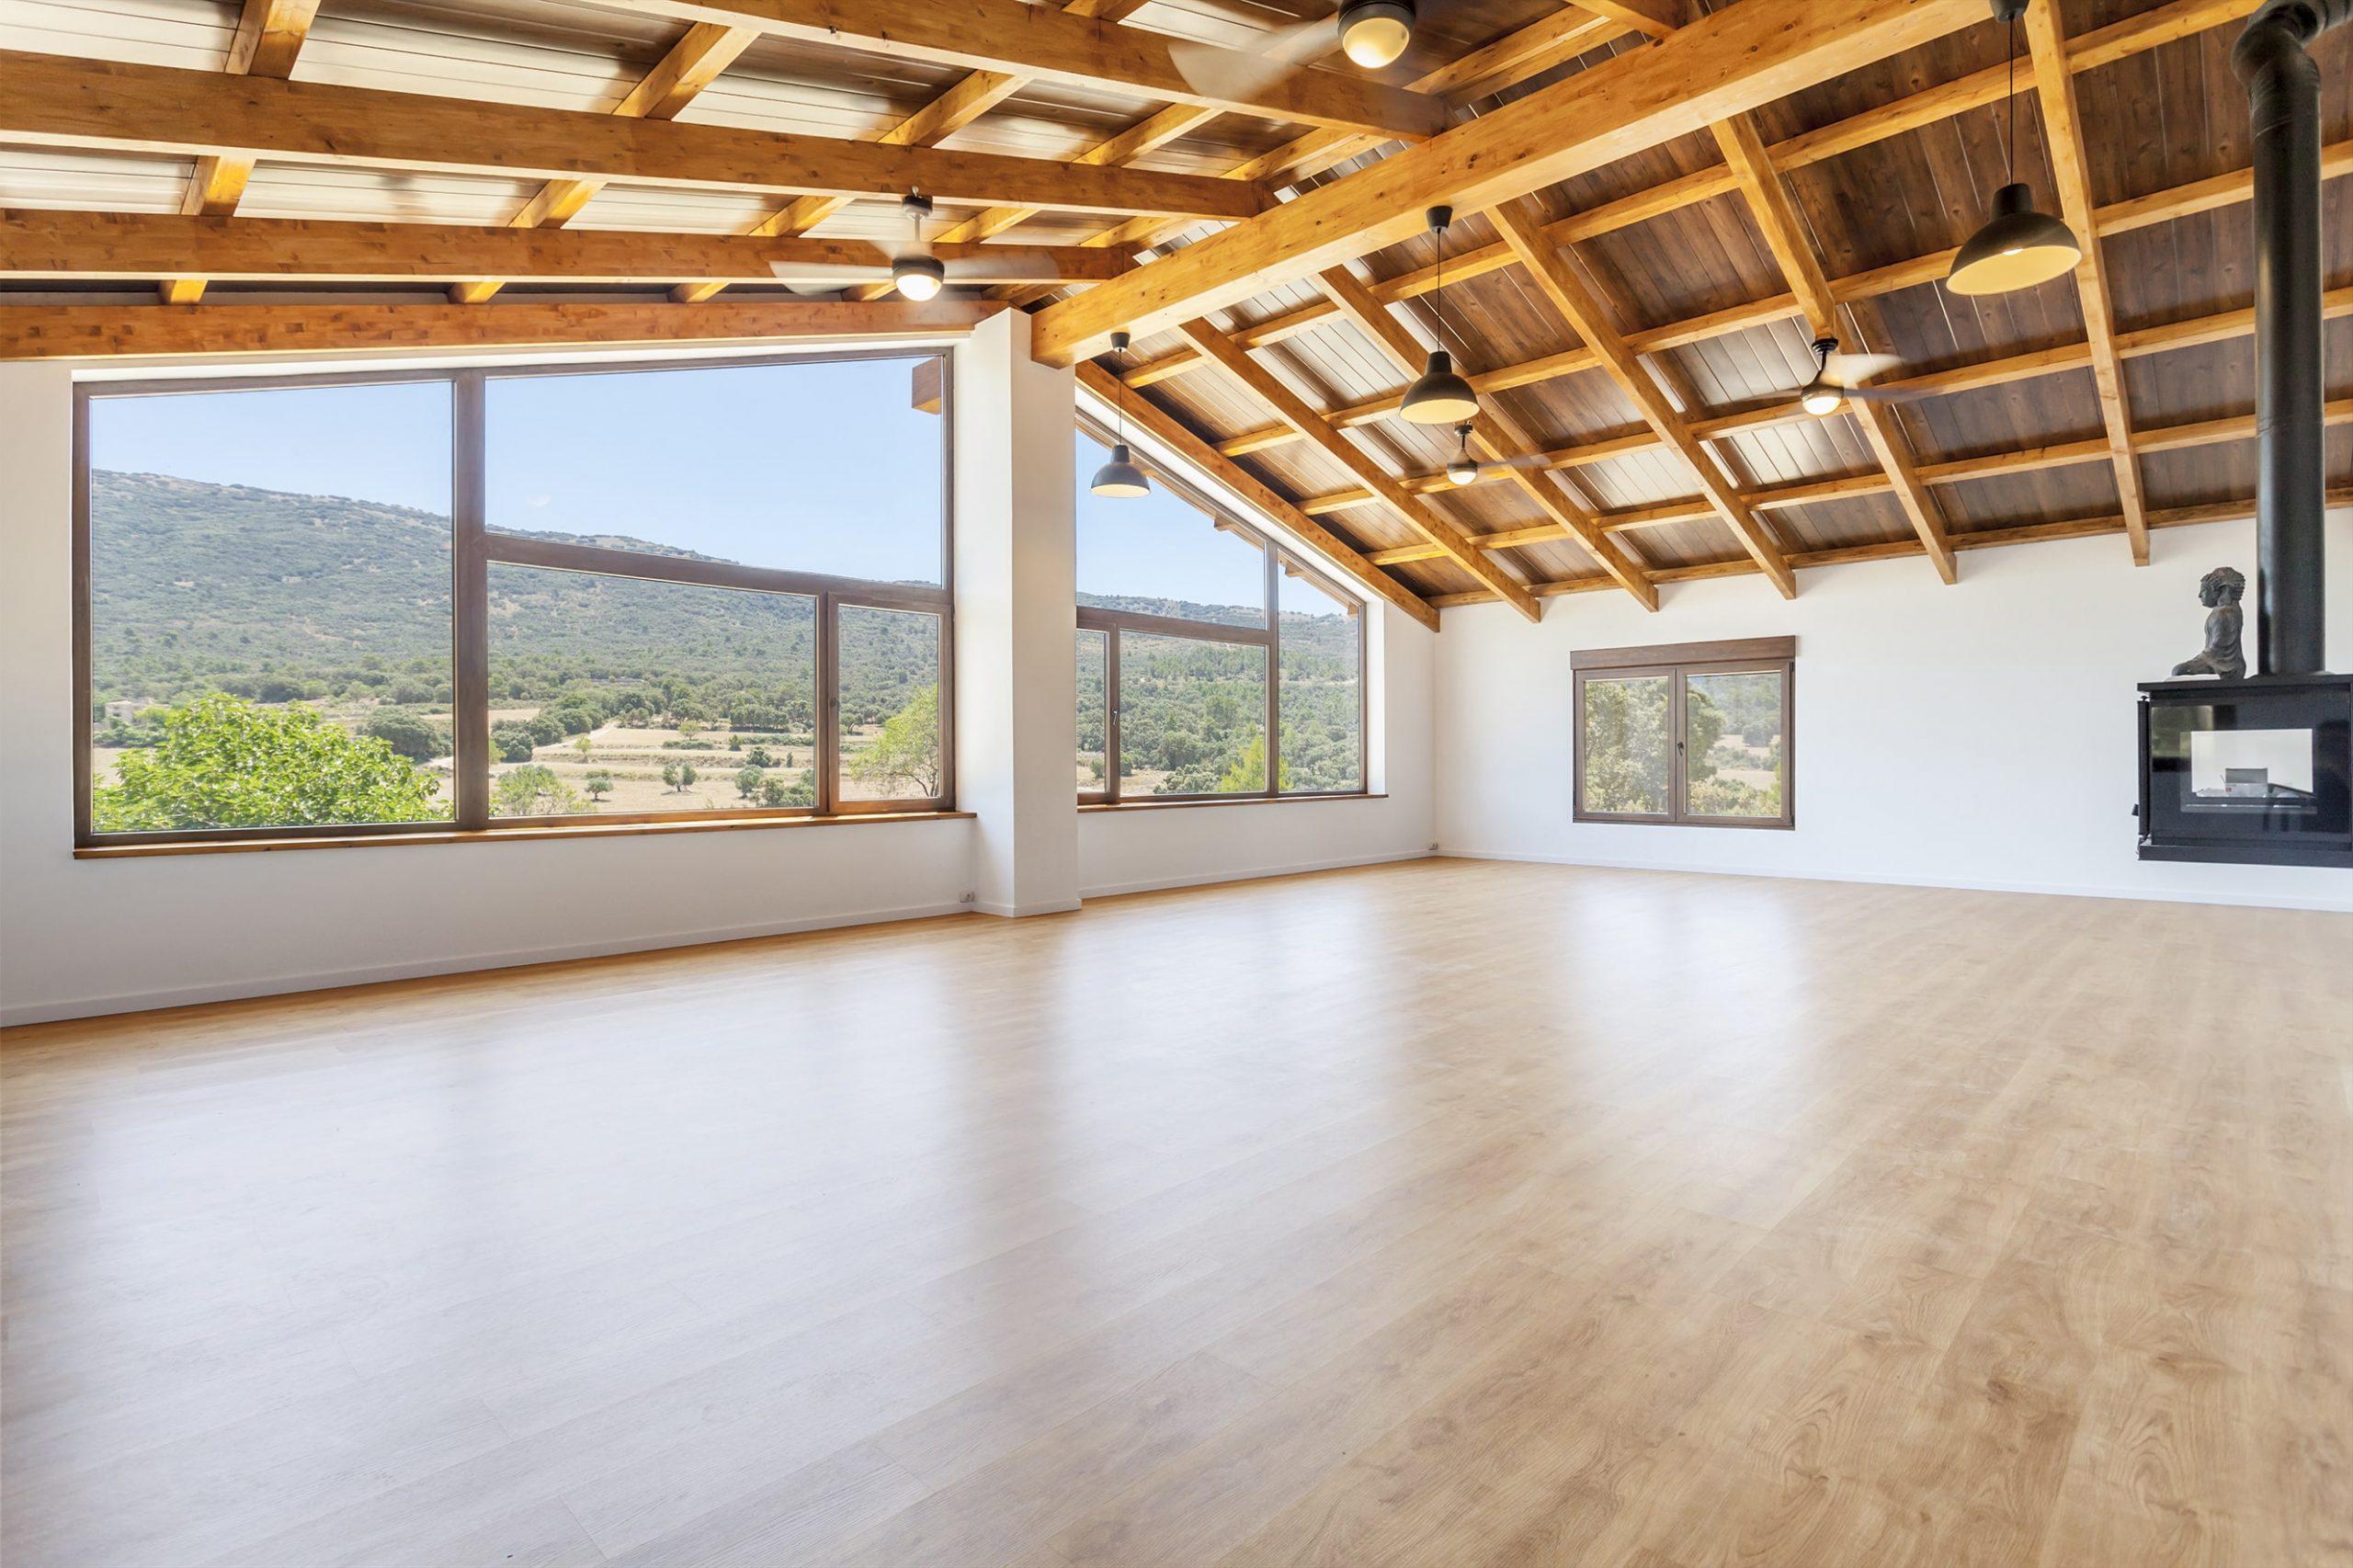 Yoga & Meditation room: